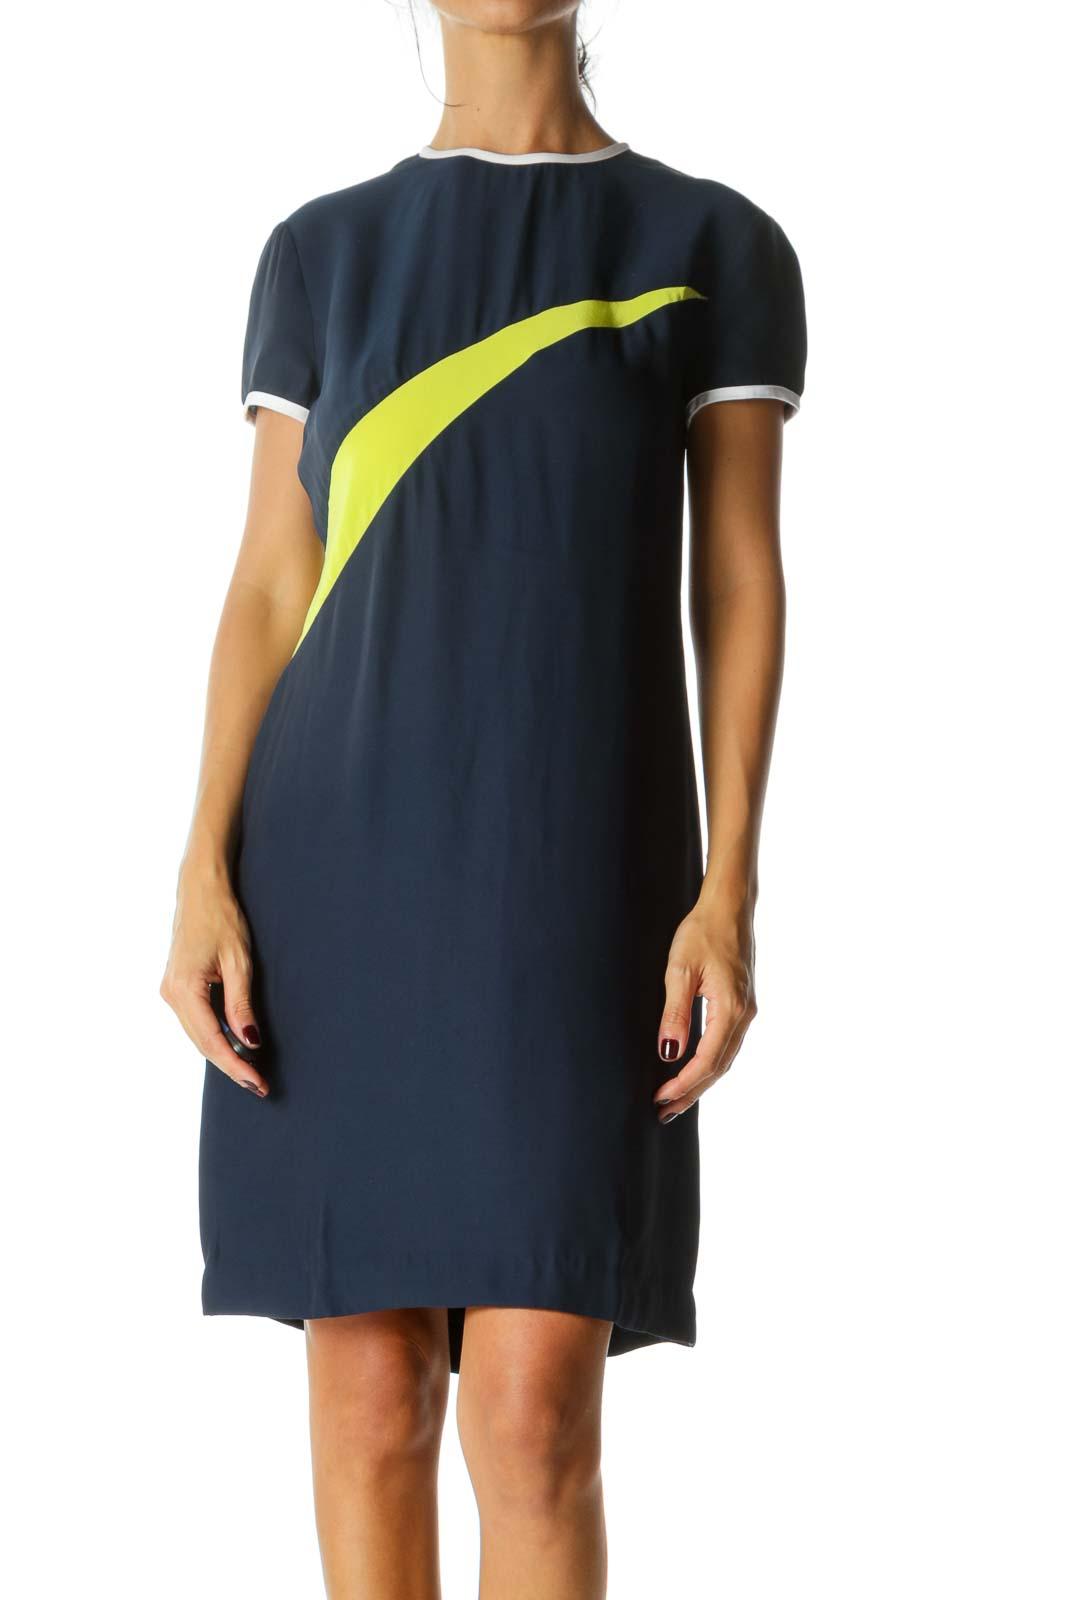 Navy Blue Fluorescent Green White Trim Short Sleeve Silk Blend Color Block Dress Front